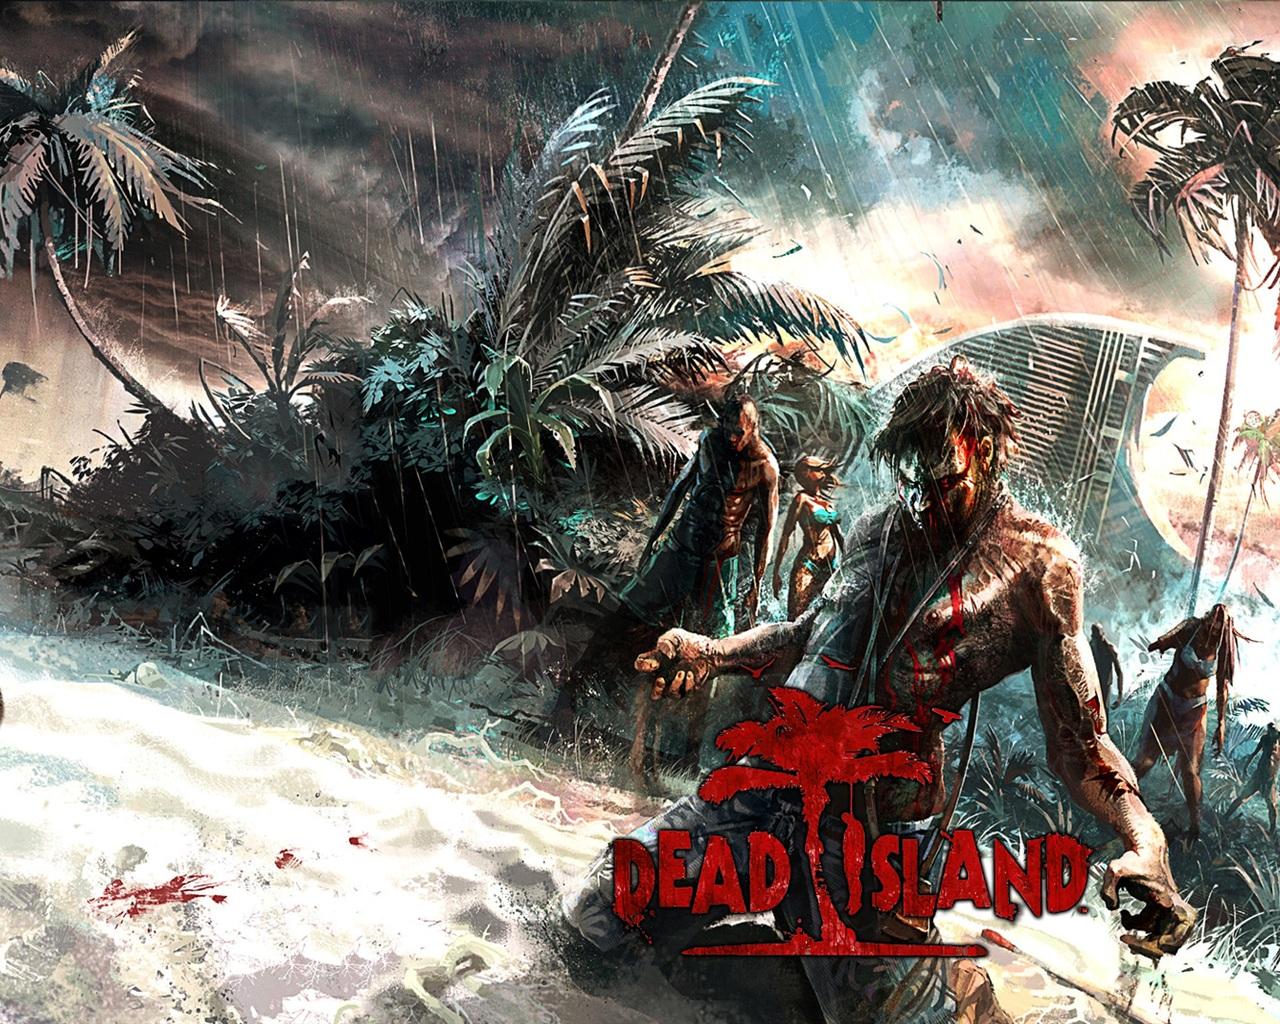 Dead Island Wallpaper 1080p - wallpaper.